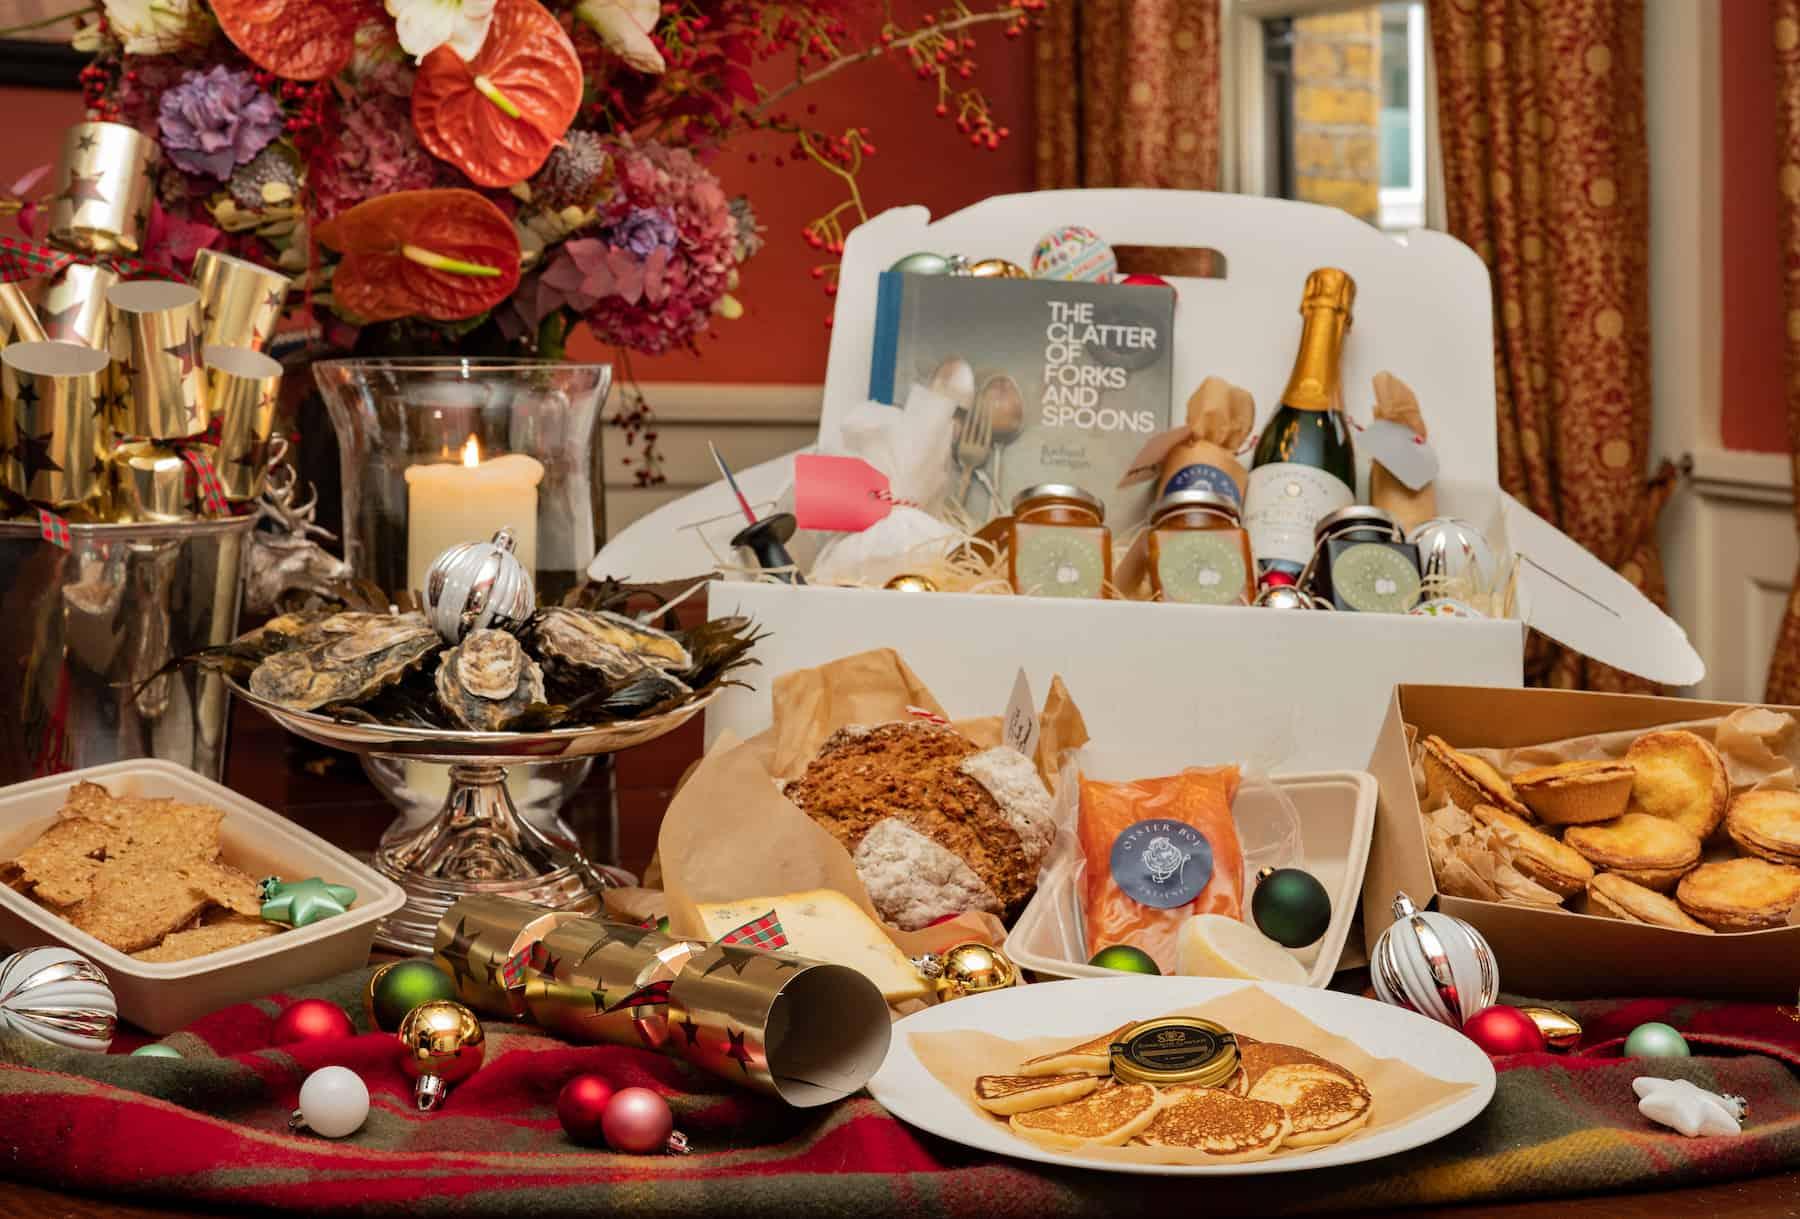 Bentley's Christmas hamper Food & Drink Christmas Gift Guide